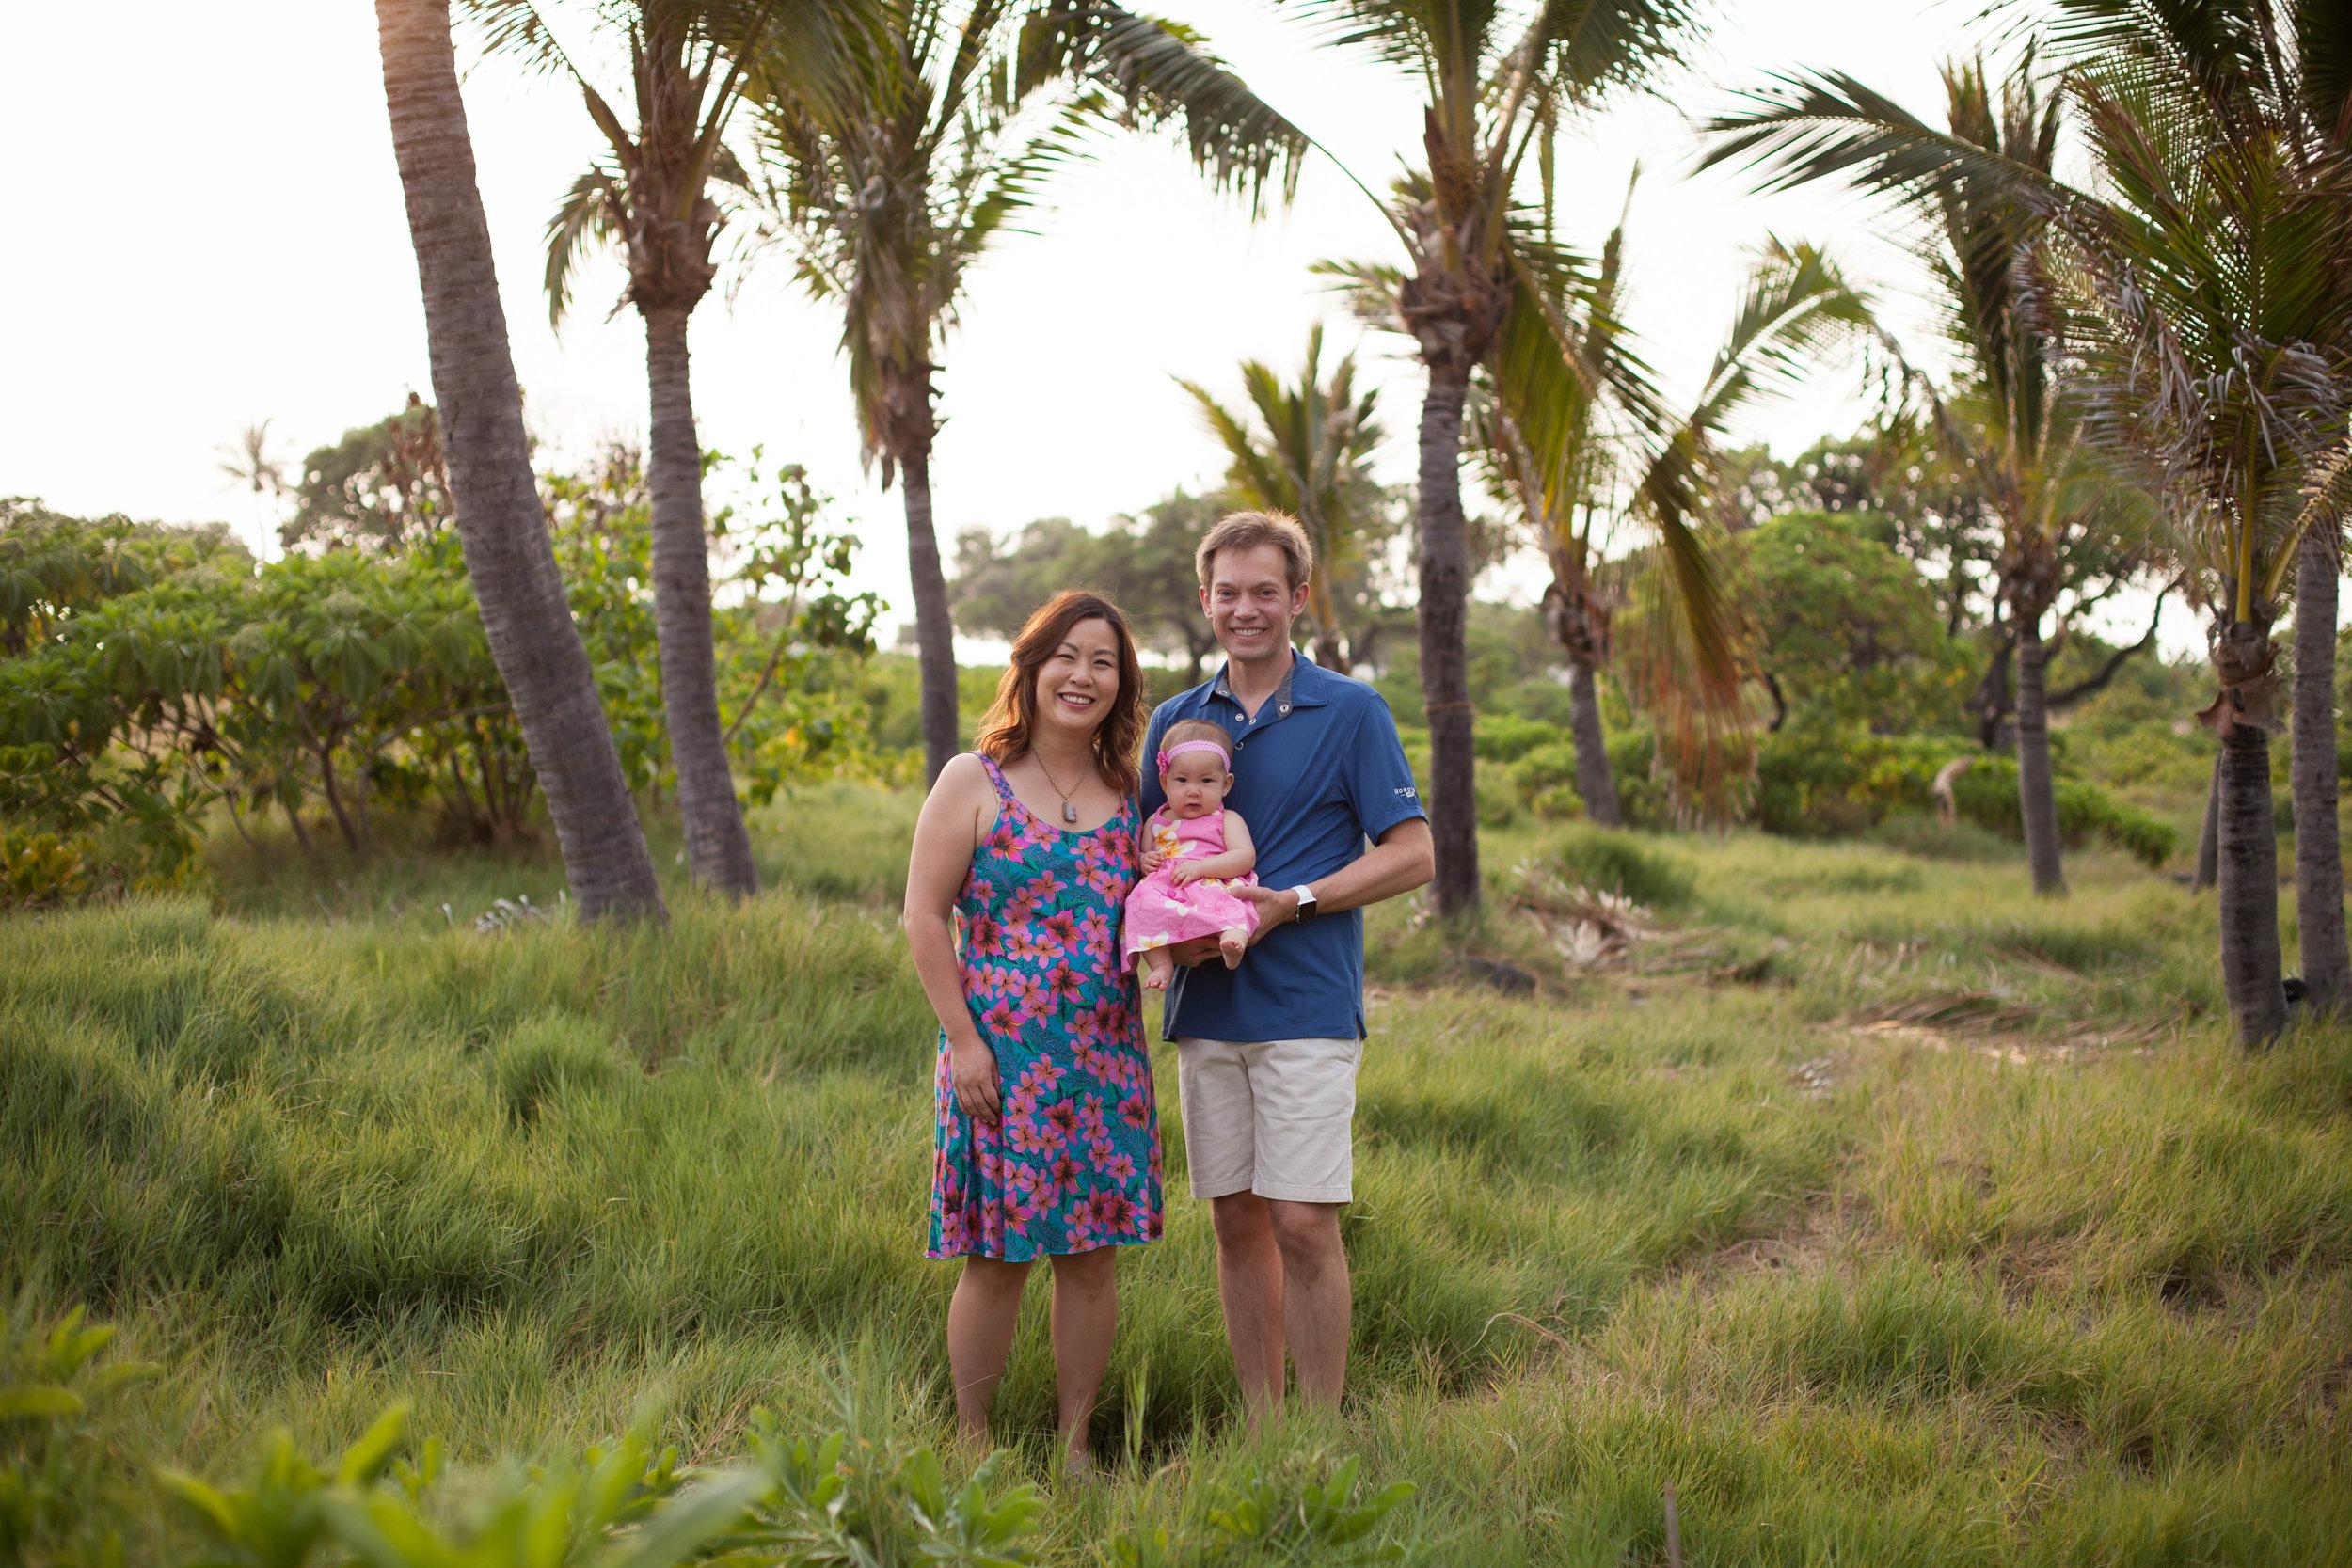 big island hawaii old kona airport beach family © kelilina photography 20170405174354.jpg